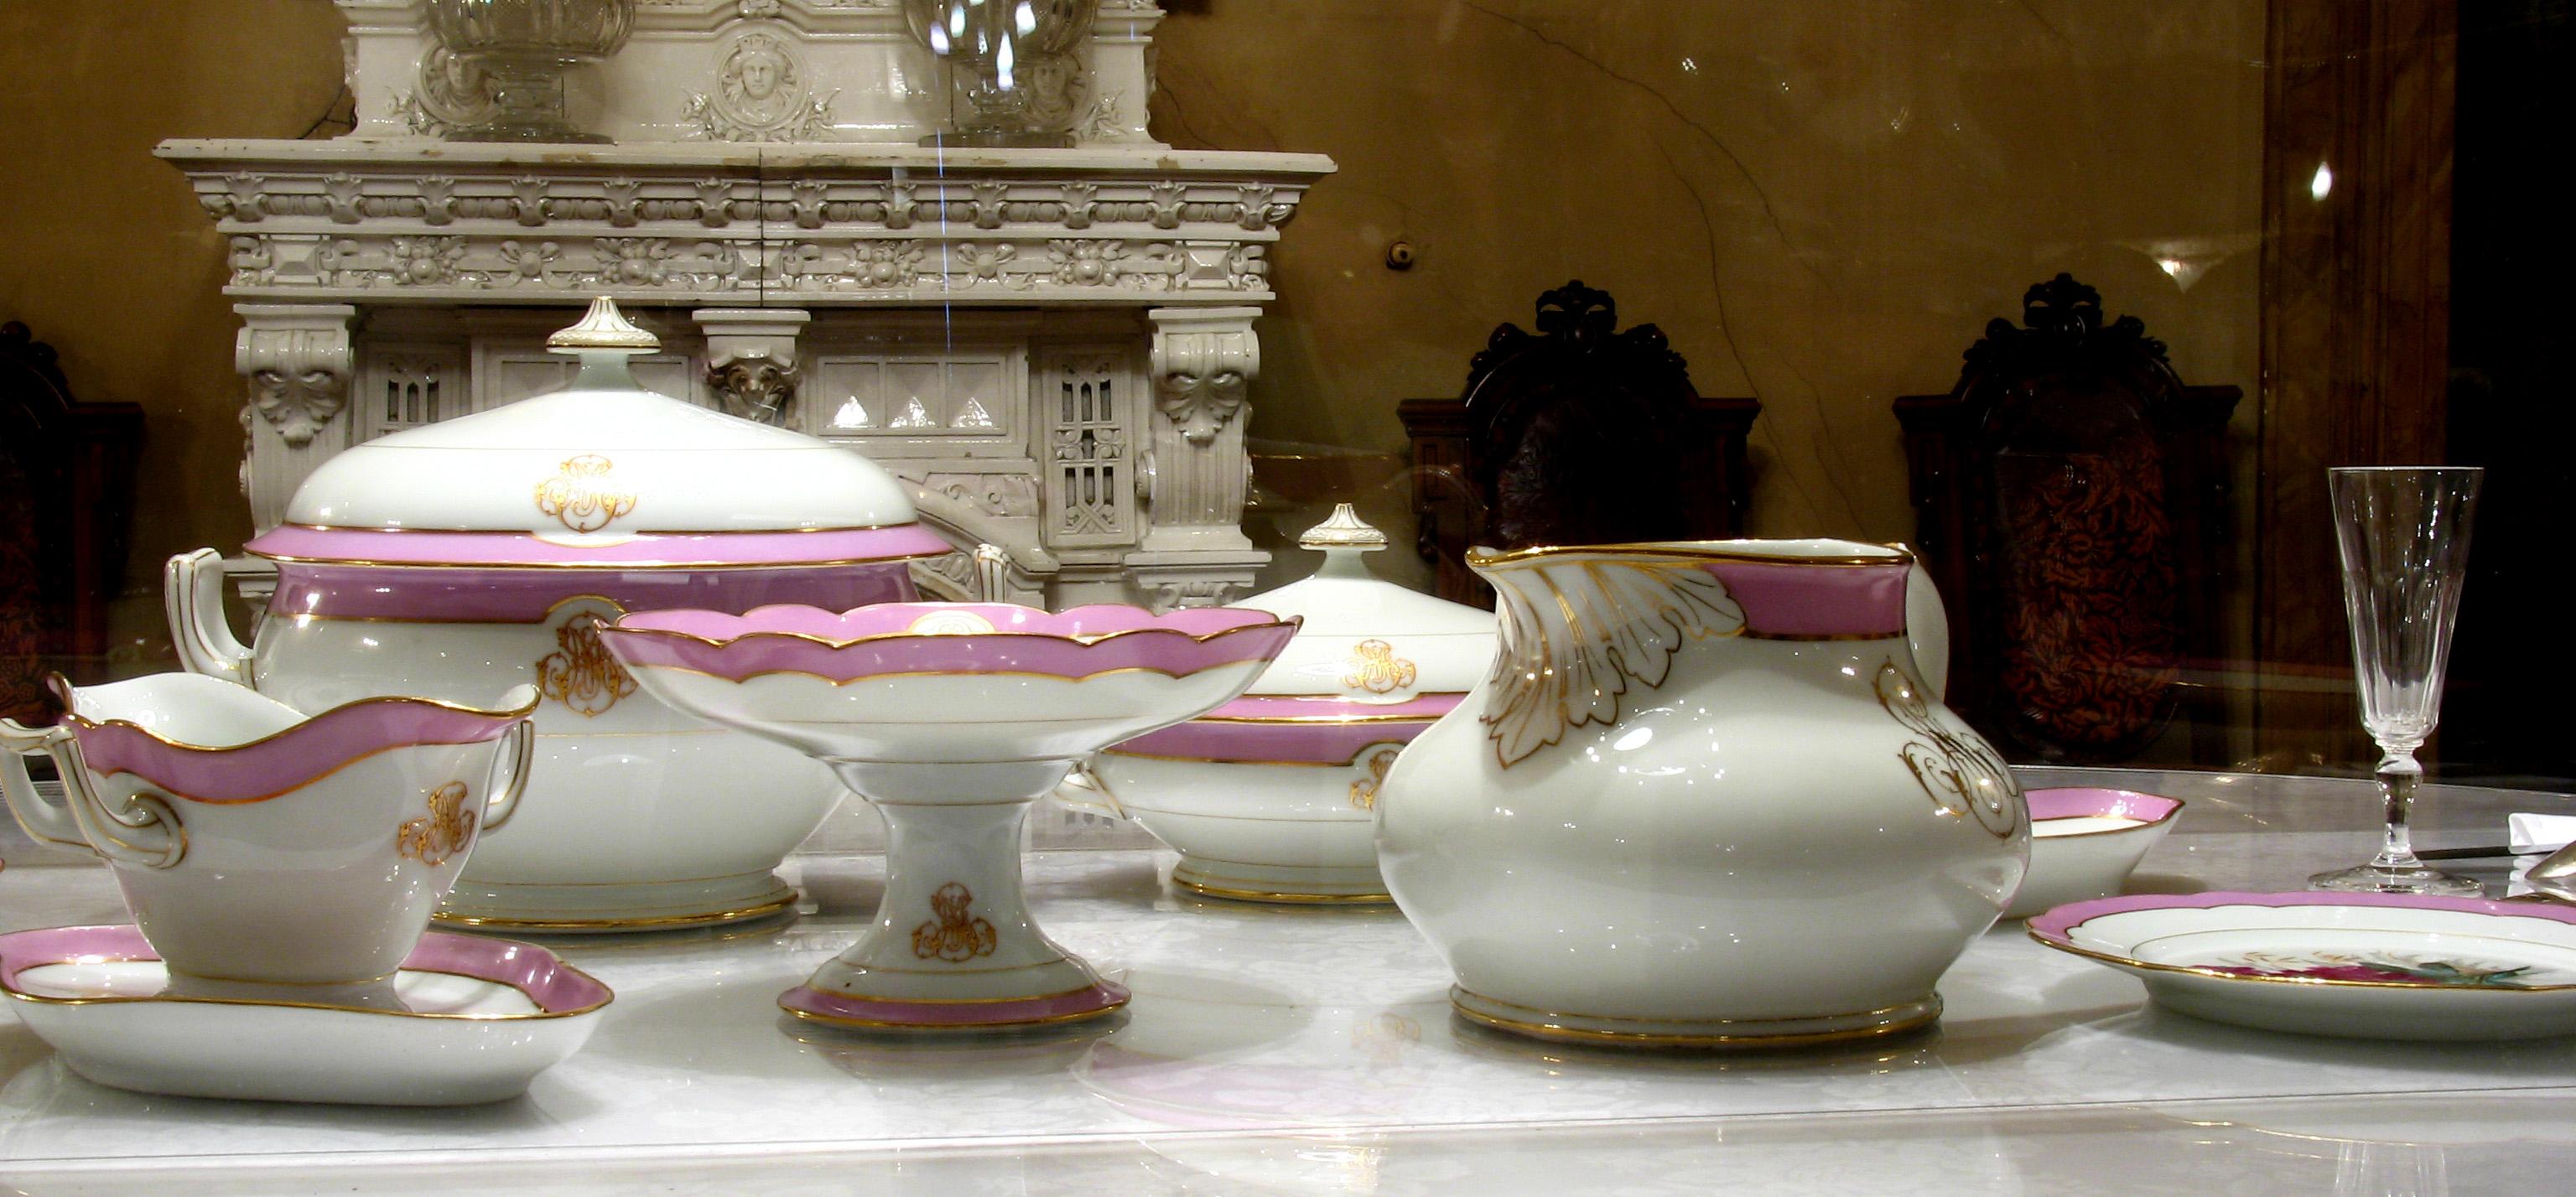 Servizi in porcellana francese Pillivuit